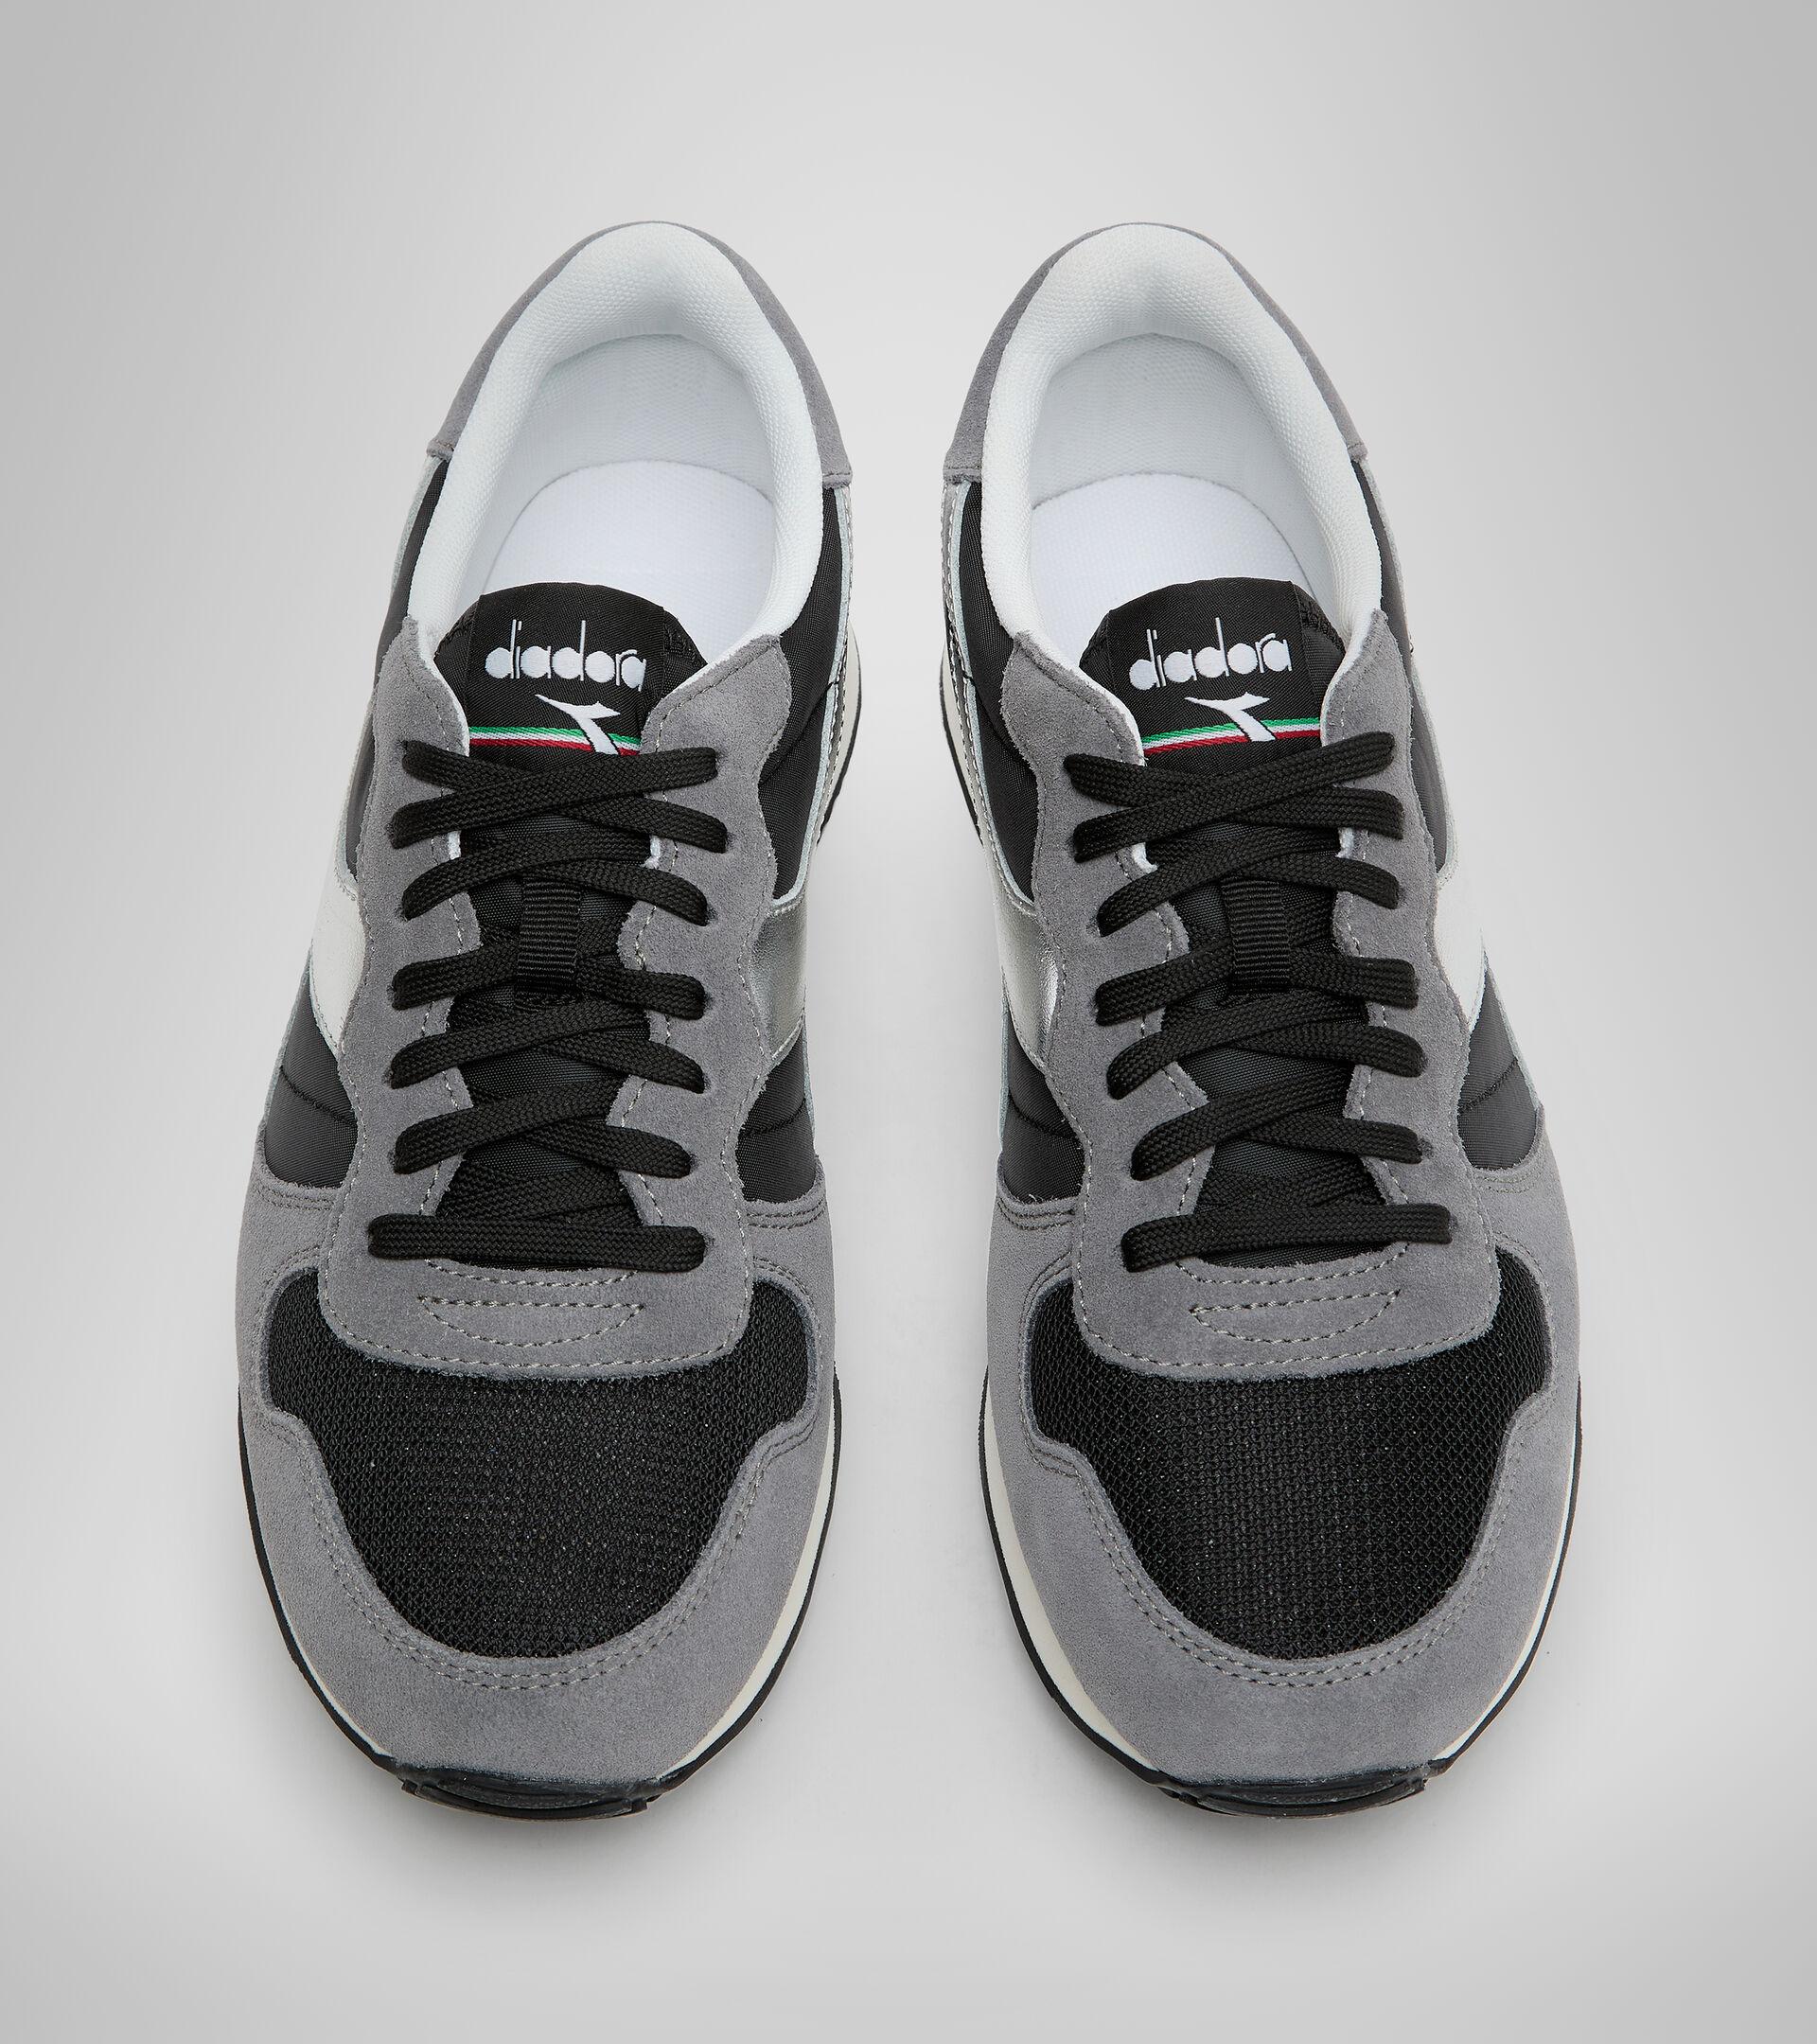 Footwear Sportswear UNISEX CAMARO METAL NEGRO Diadora